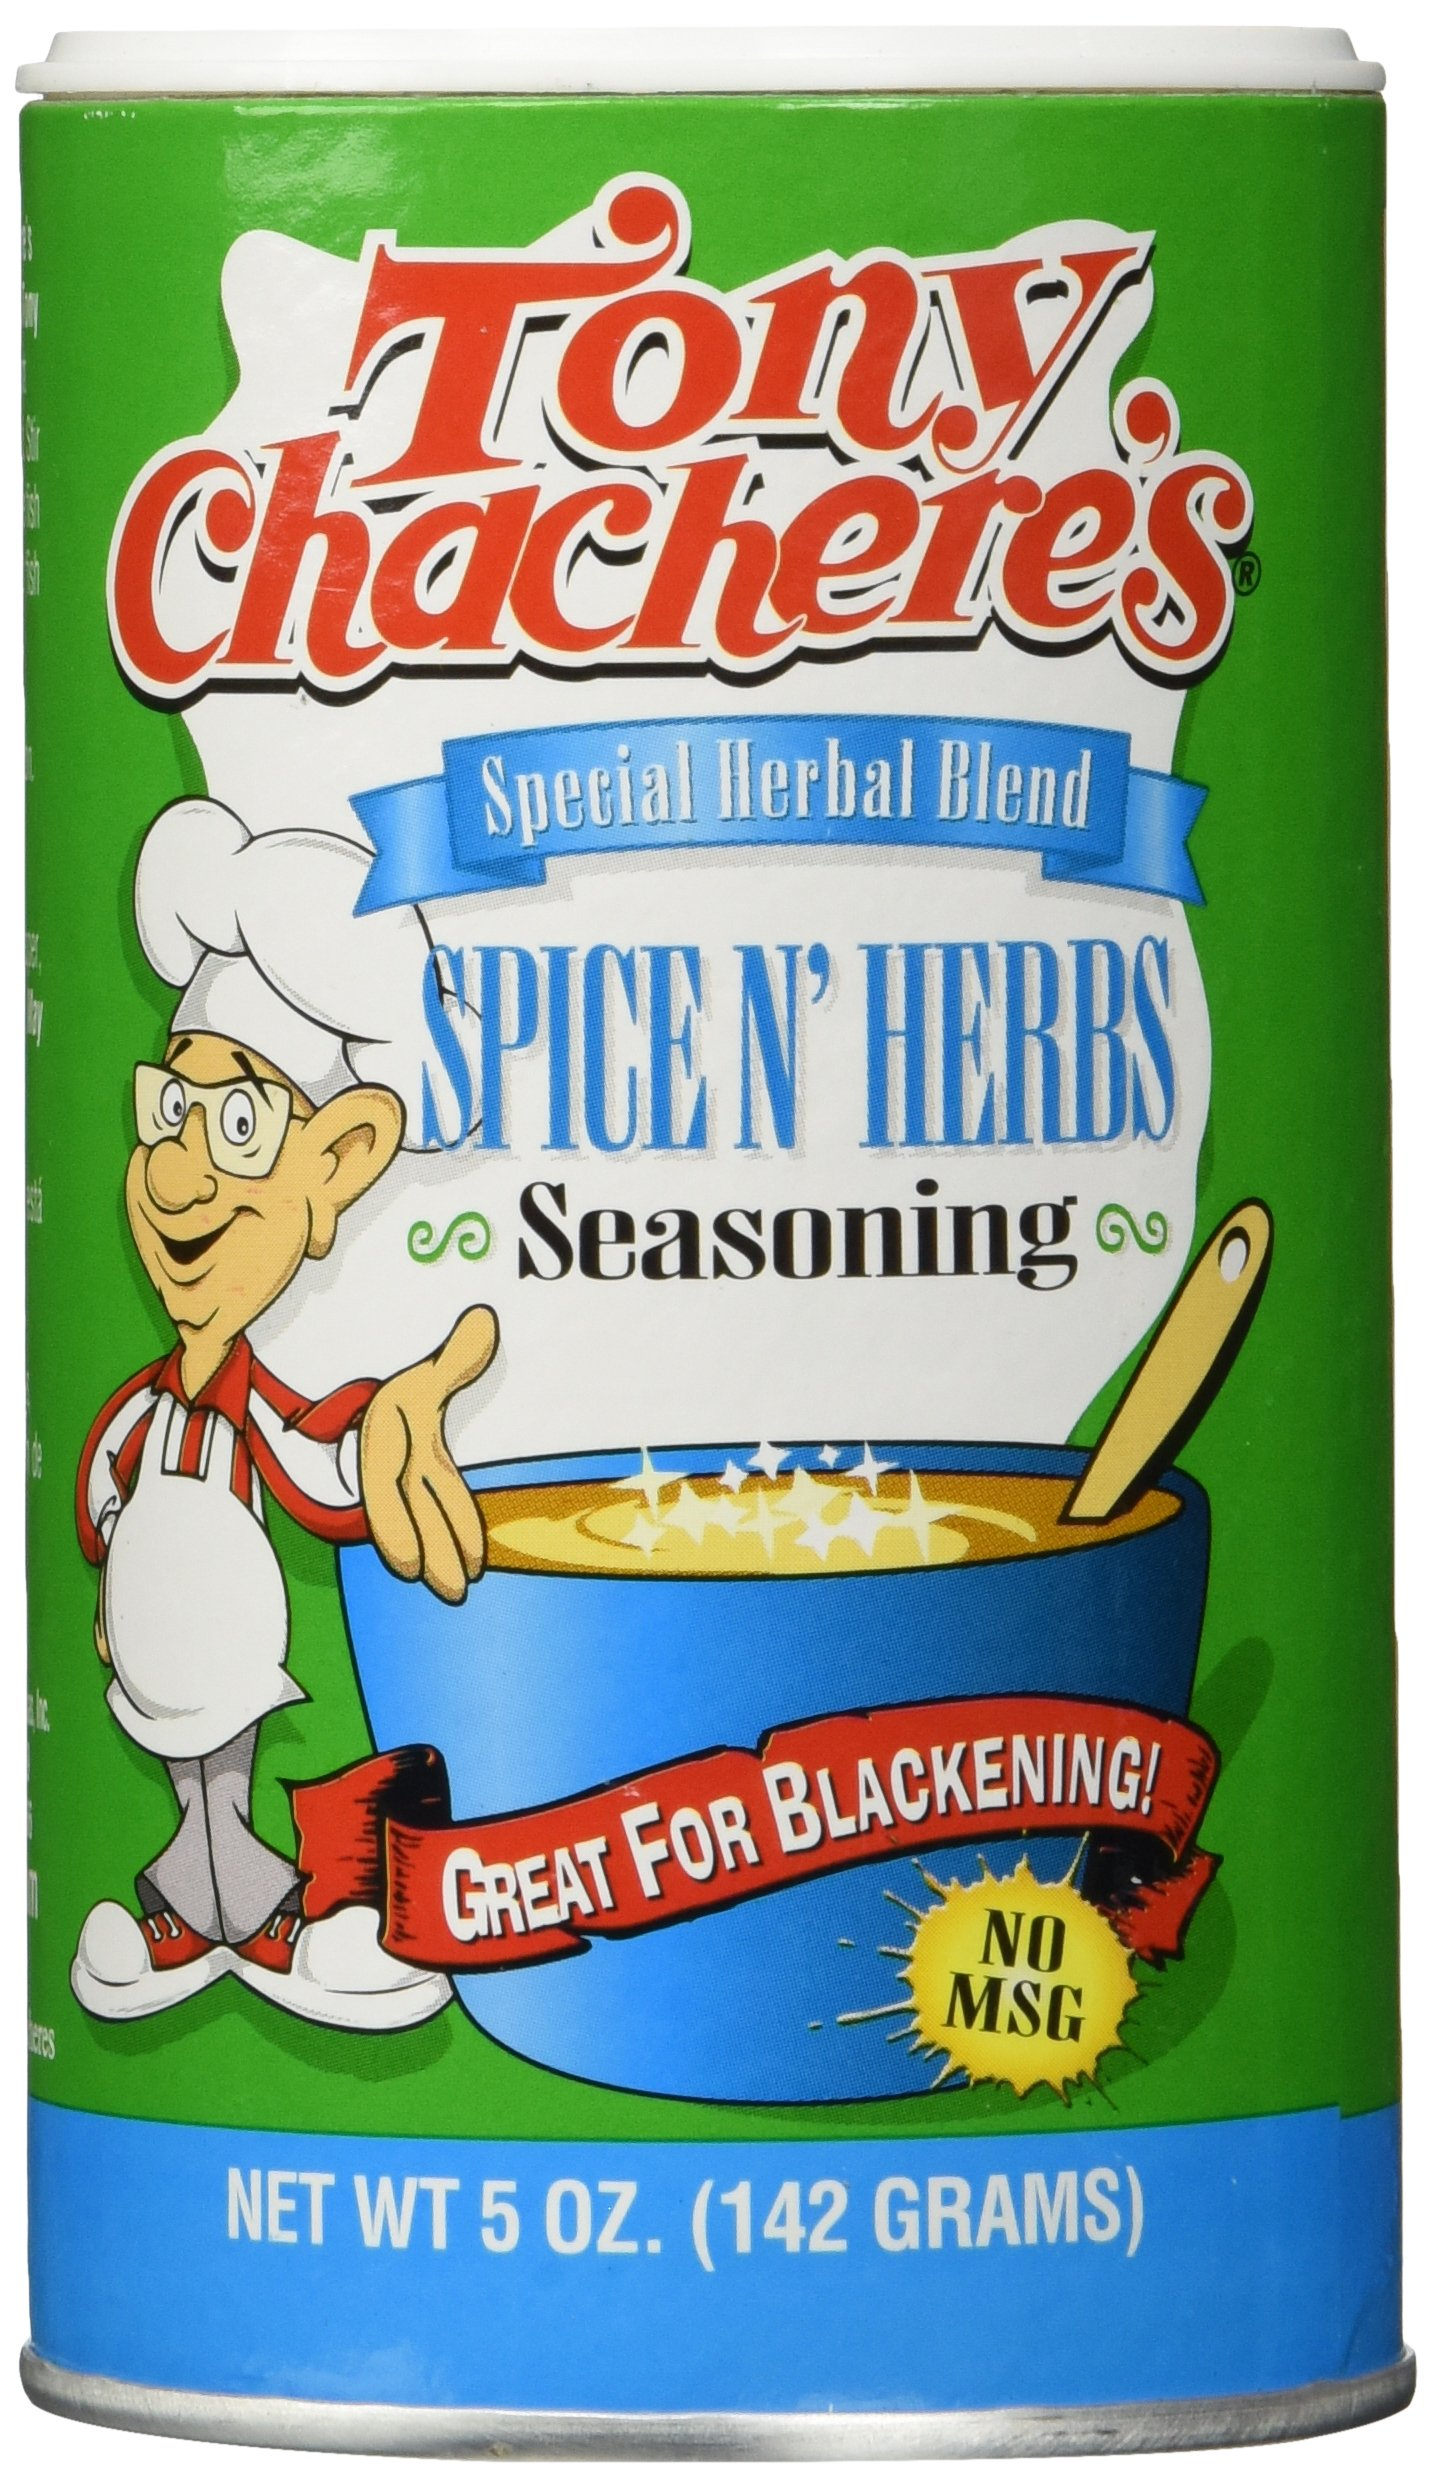 Tony Chachere's Special Herbal Blend Spice N' Herb Seasoning - 5 oz